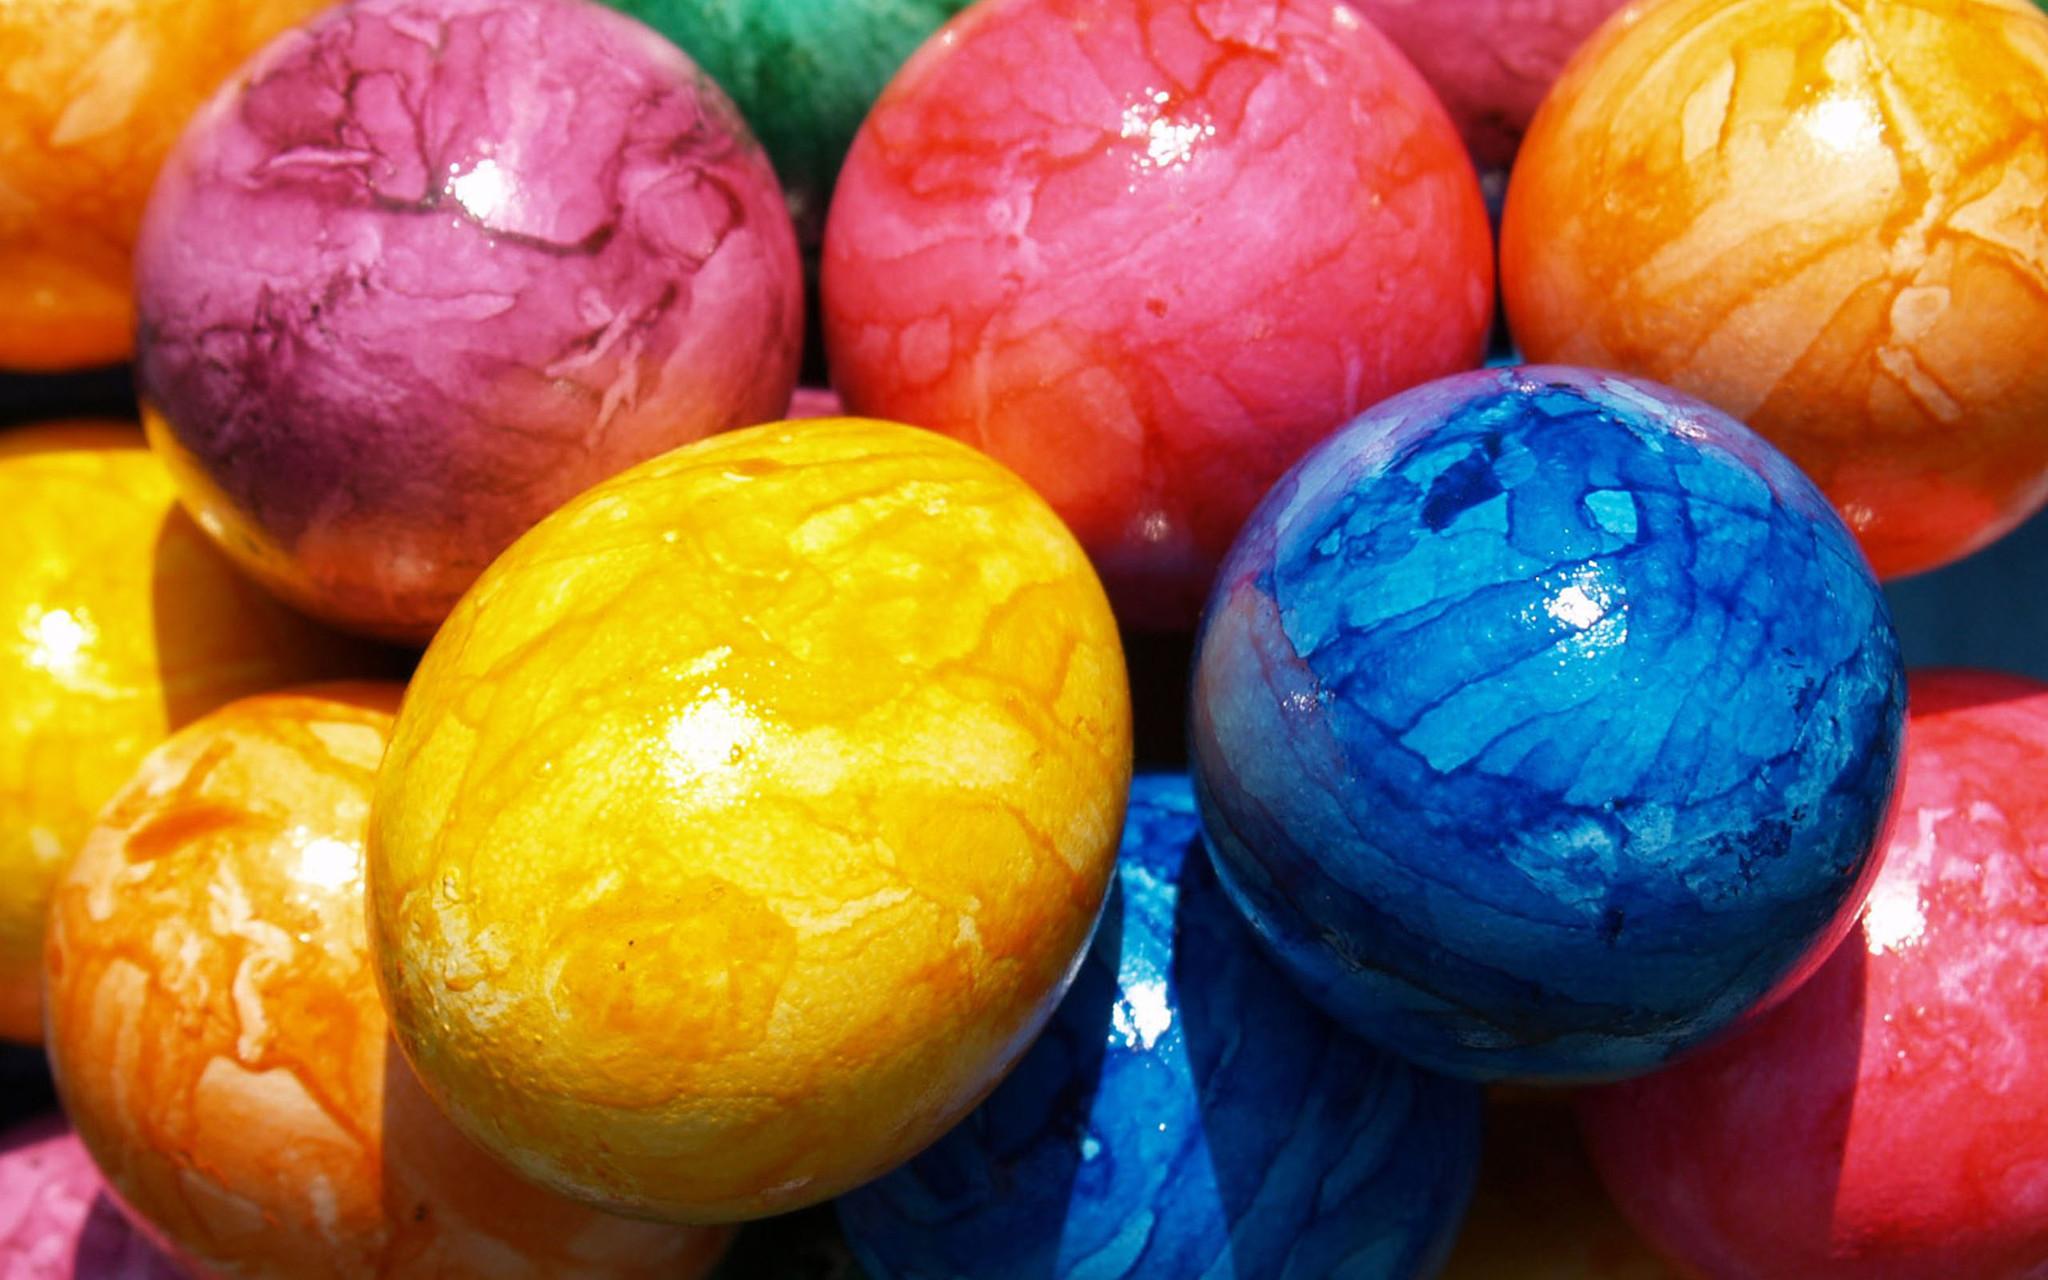 Dying Easter Eggs Krups Egg Cooker Helps Make Perfect Sparkled - Color-easter-eggs